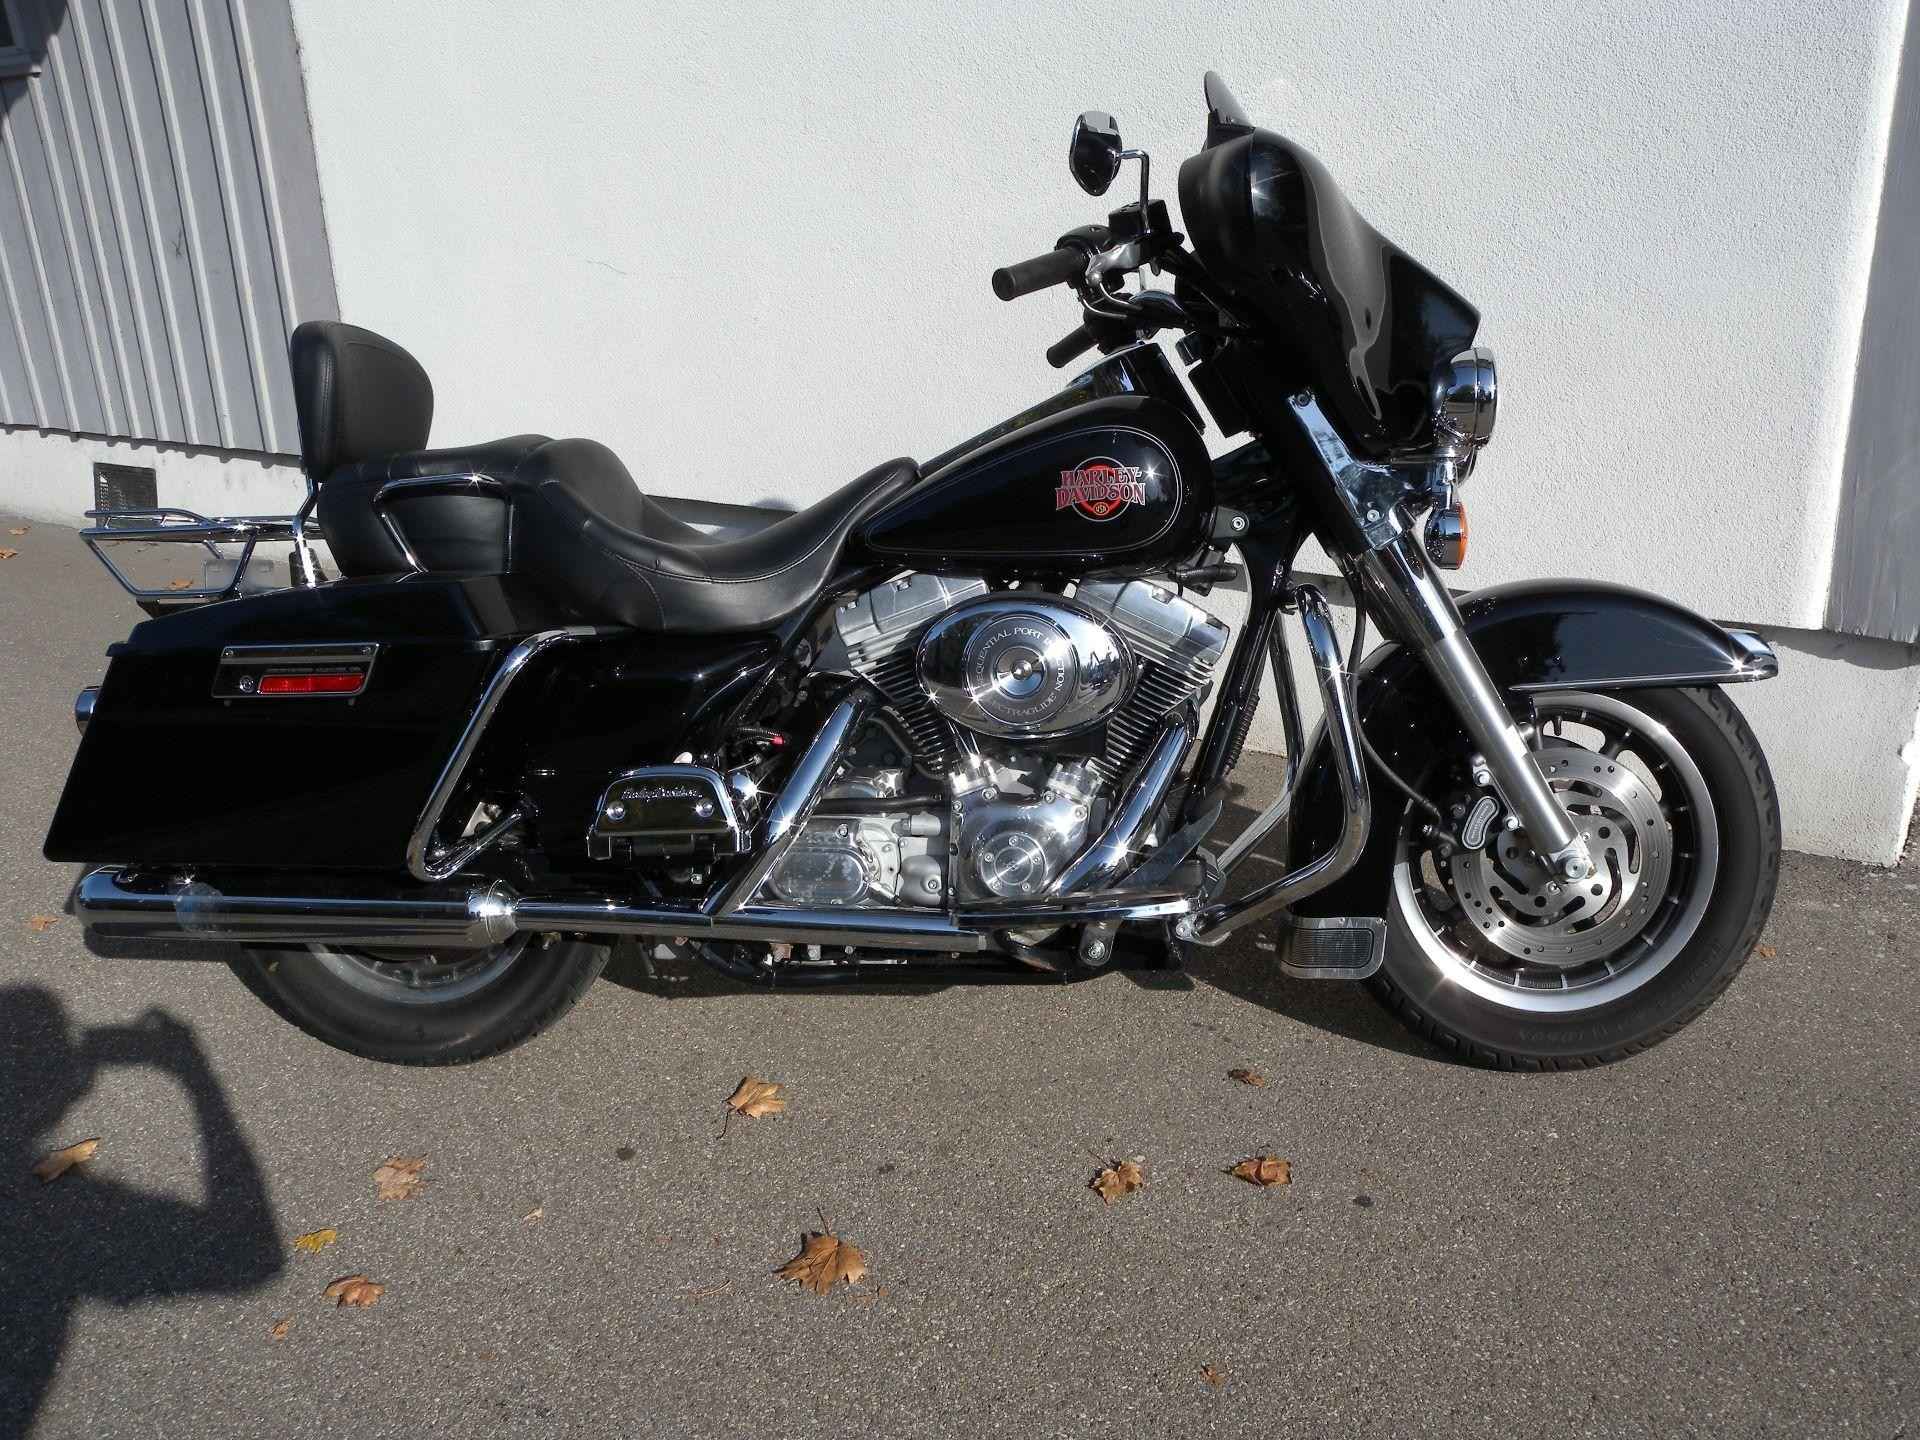 motorrad occasion kaufen harley davidson flhti 1450 electra glide tomotos frauenfeld. Black Bedroom Furniture Sets. Home Design Ideas